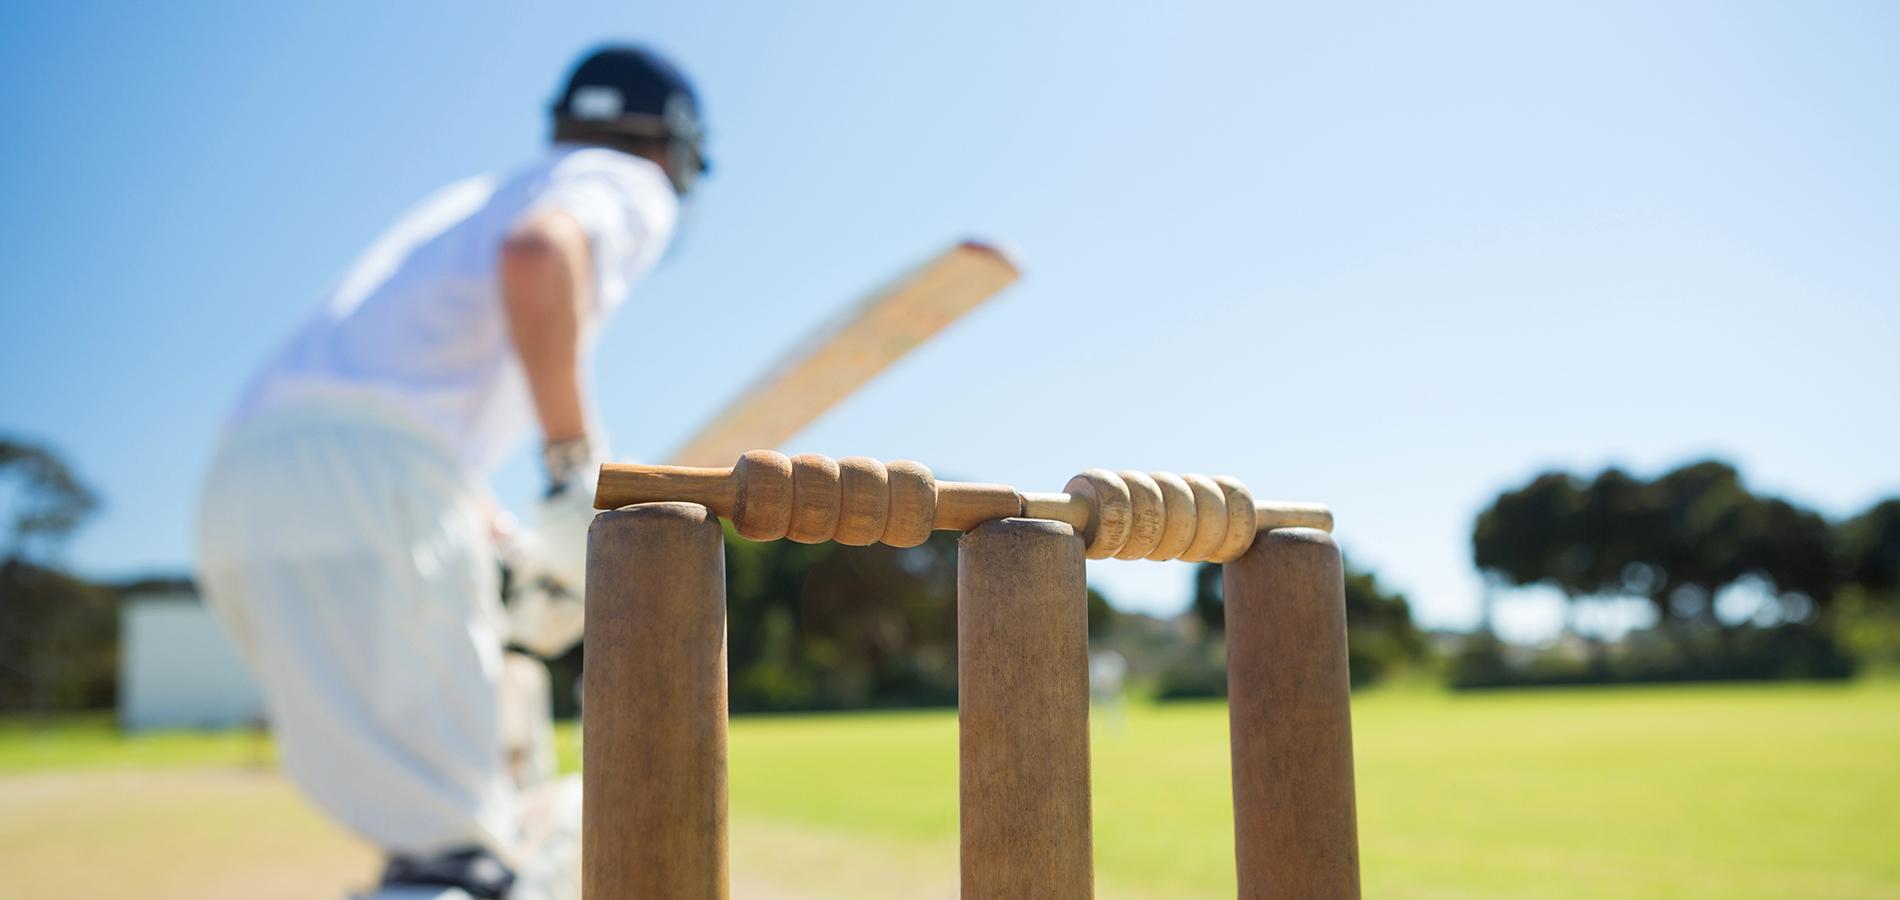 cricket blog image 1900x900